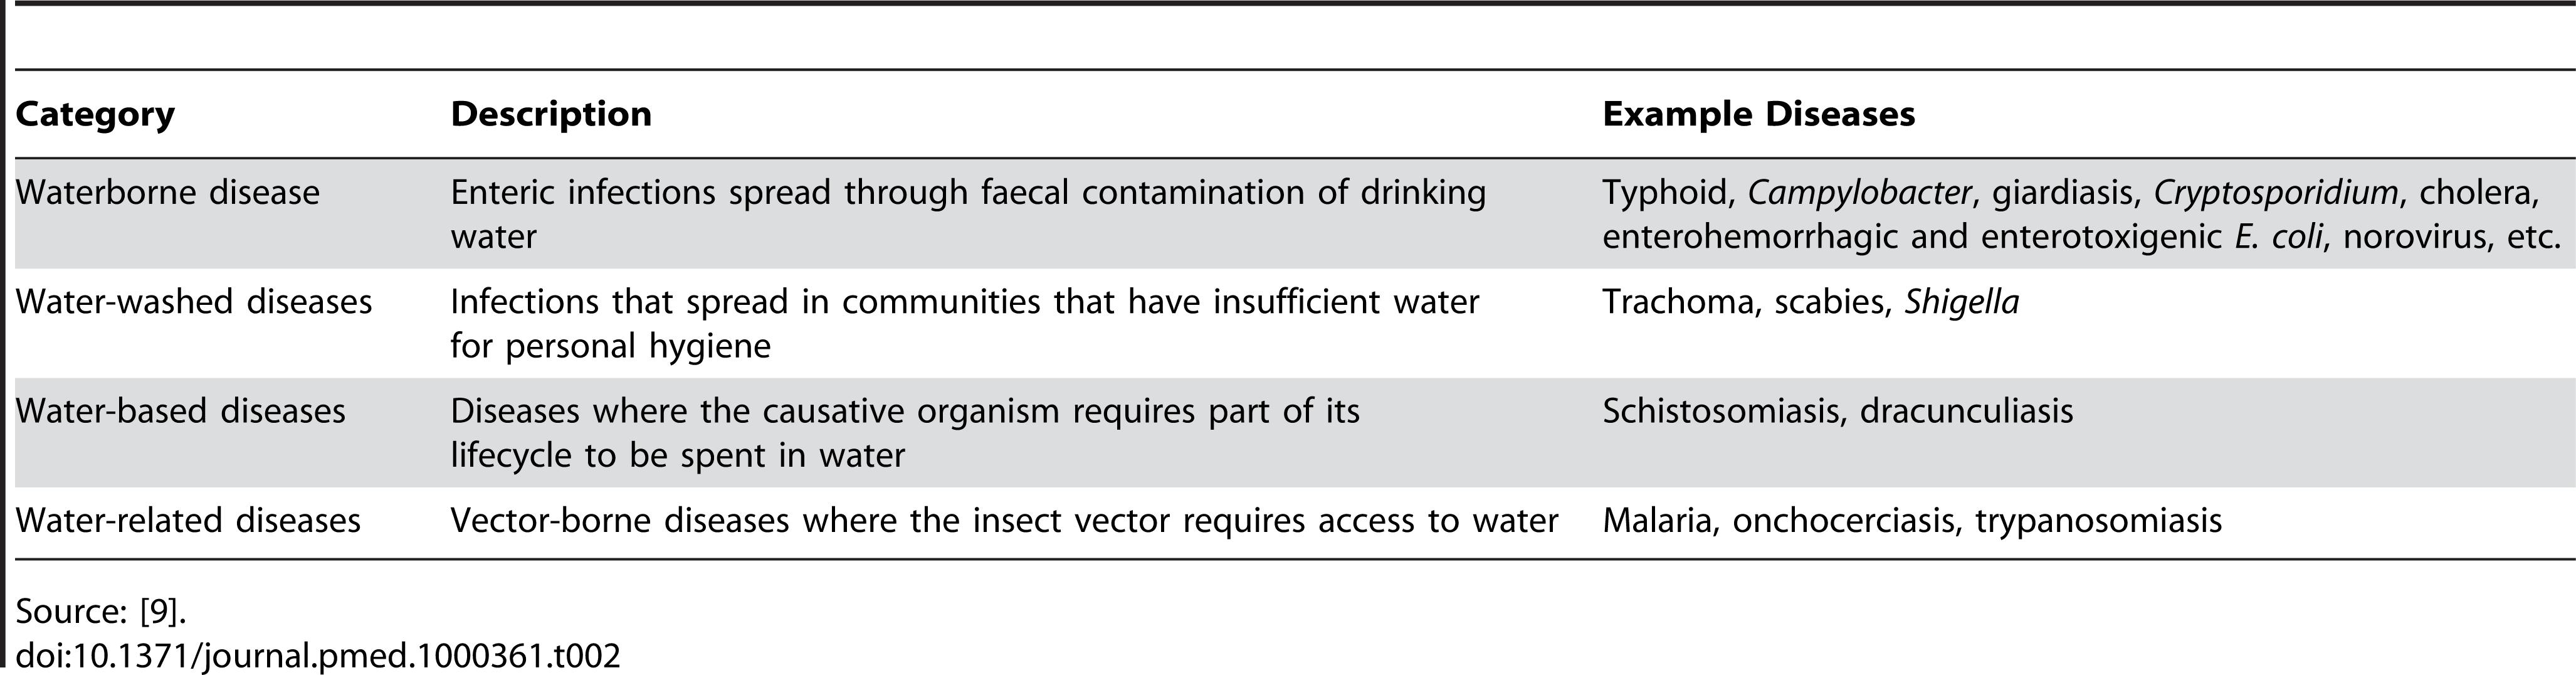 Water-related disease.